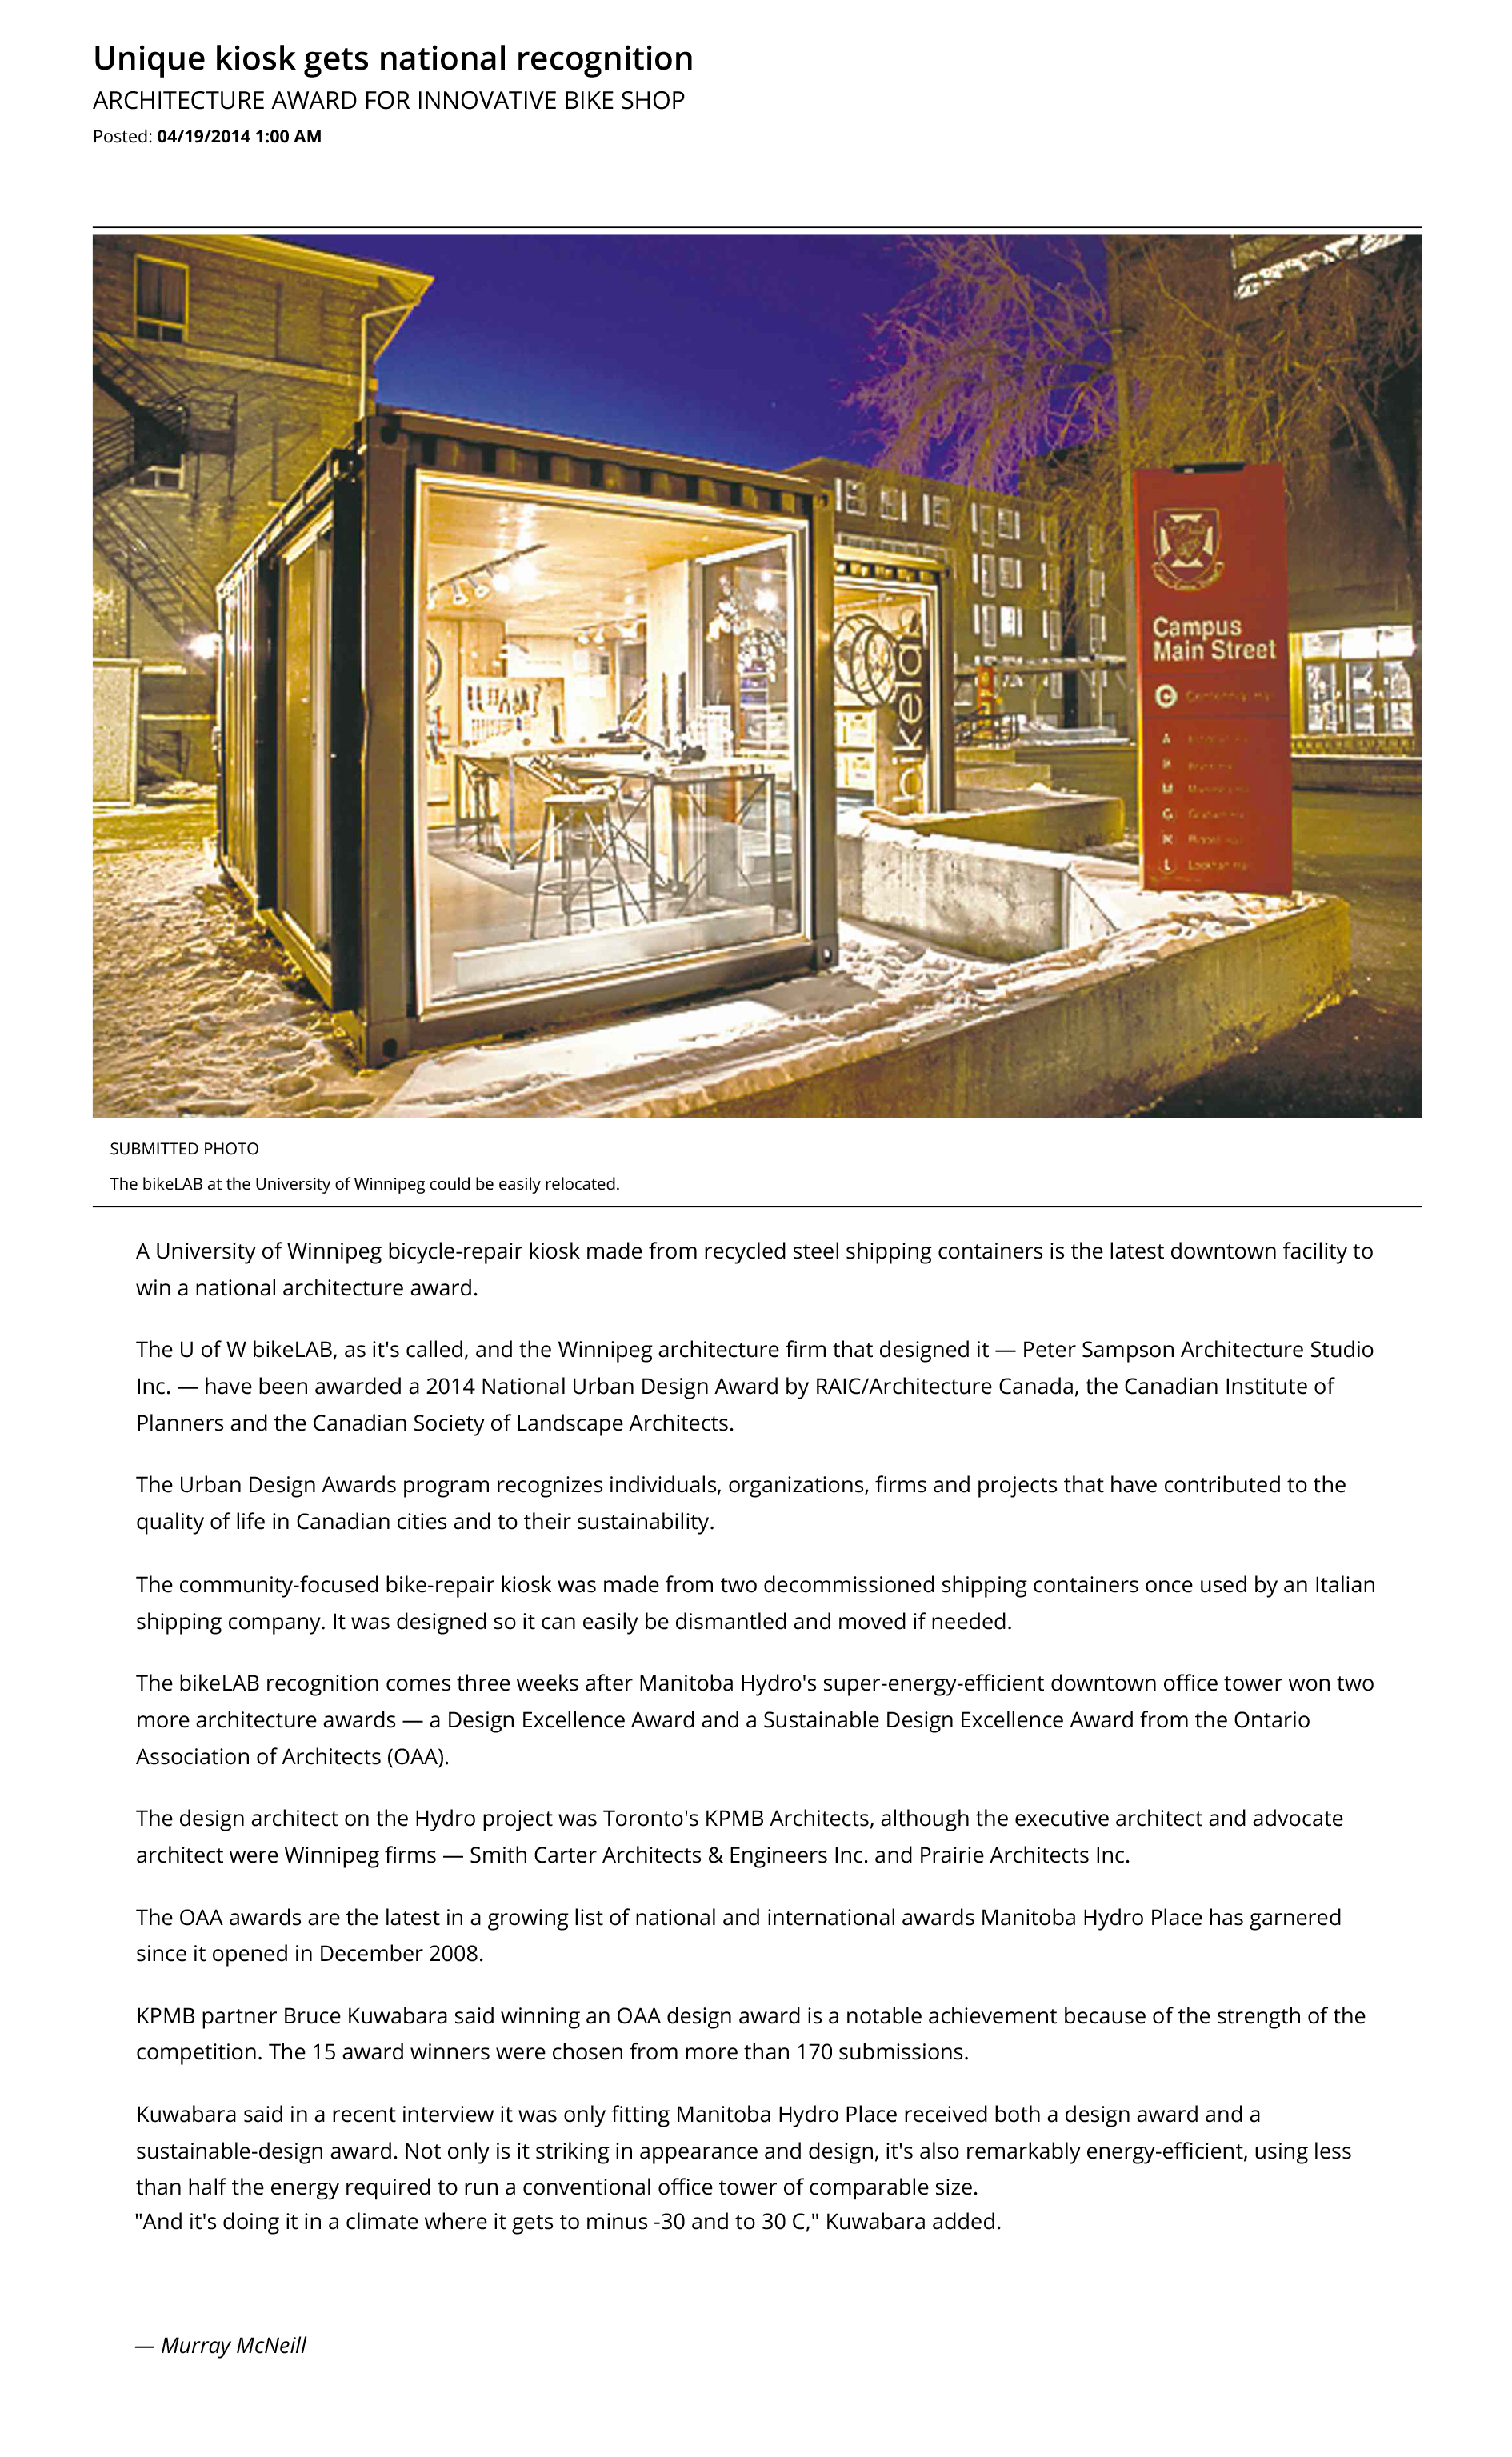 Crokicurling has turned the genteel pastime of crokinole on its ear - Winnipeg Free Press-1.jpg